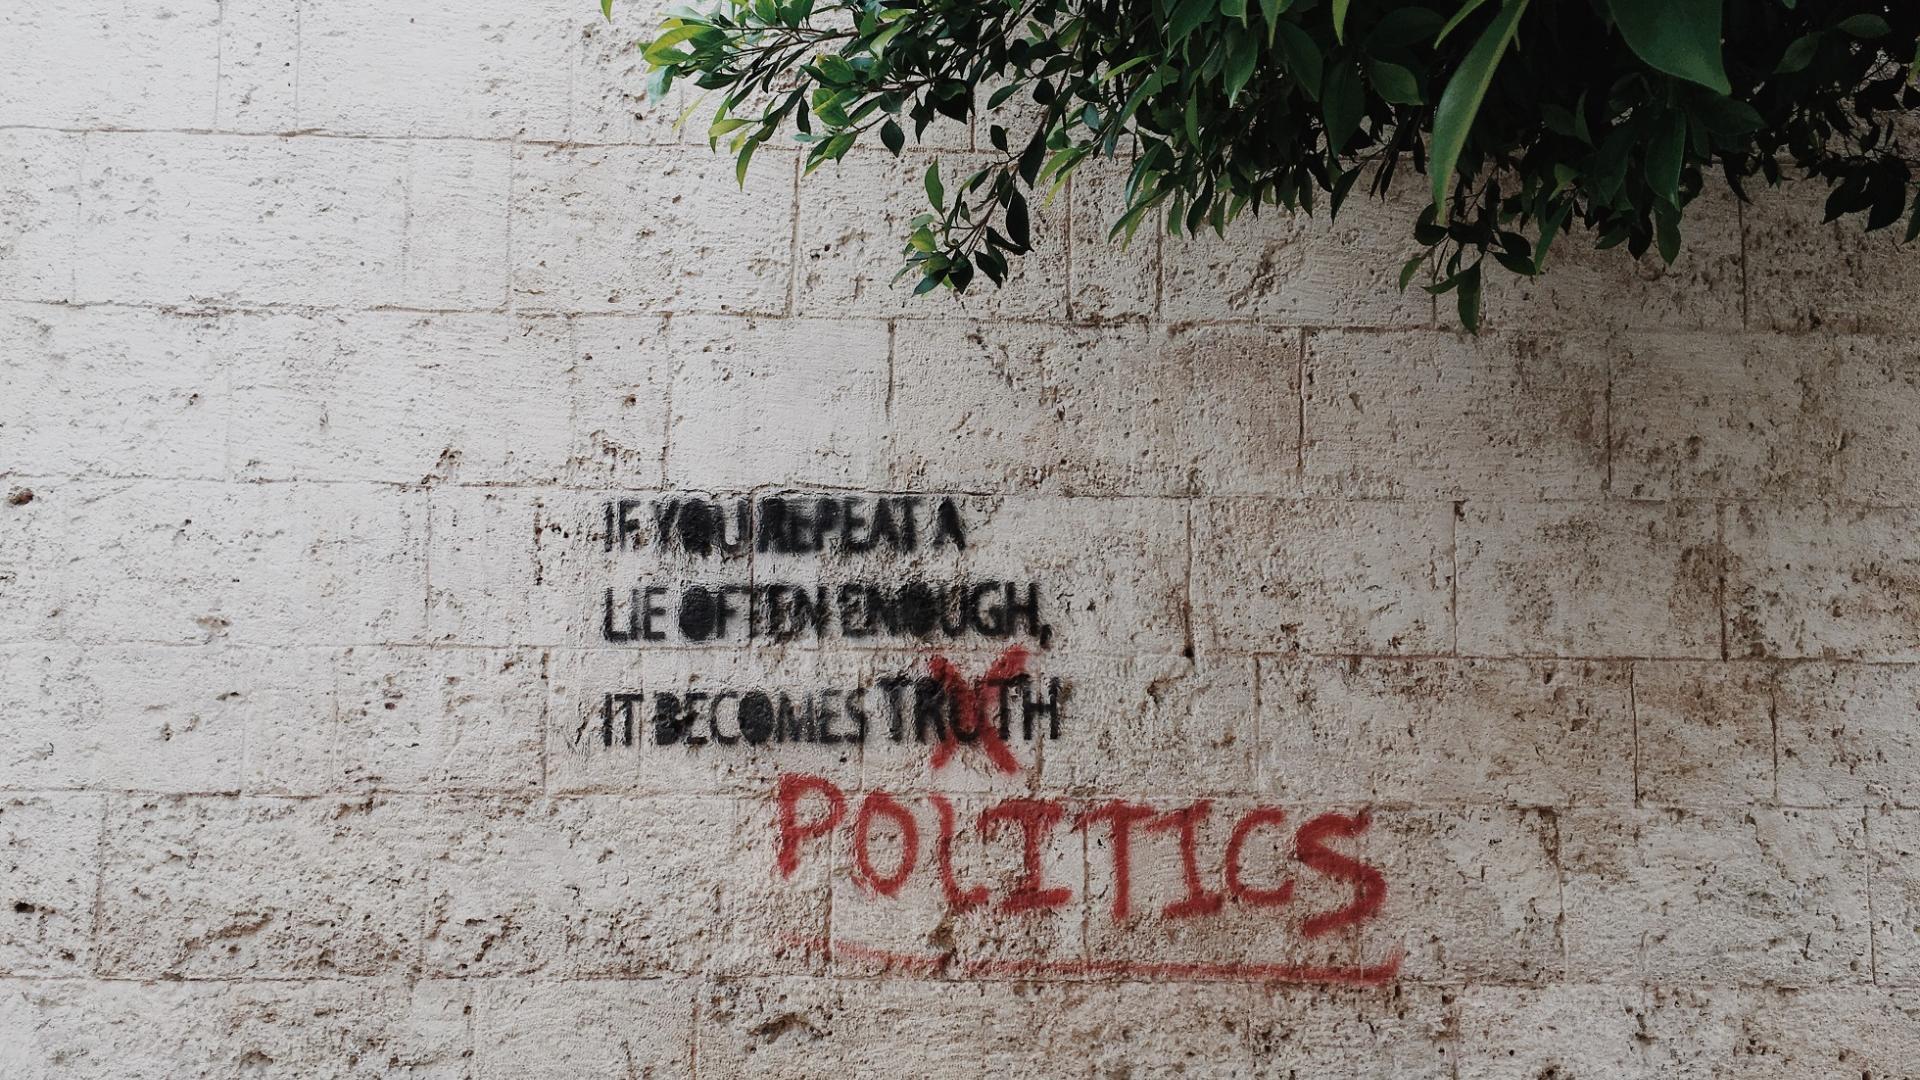 Graffiti: If you repeat a lie often enough, it becomes politics